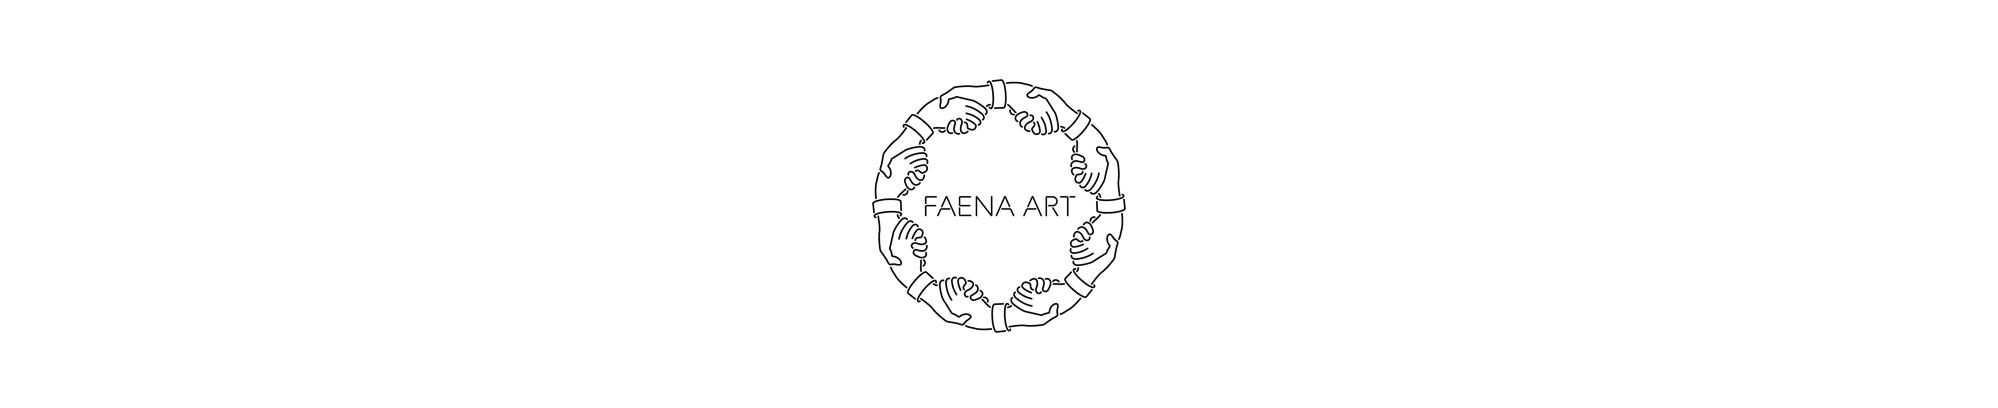 faena-art-logo_2.png